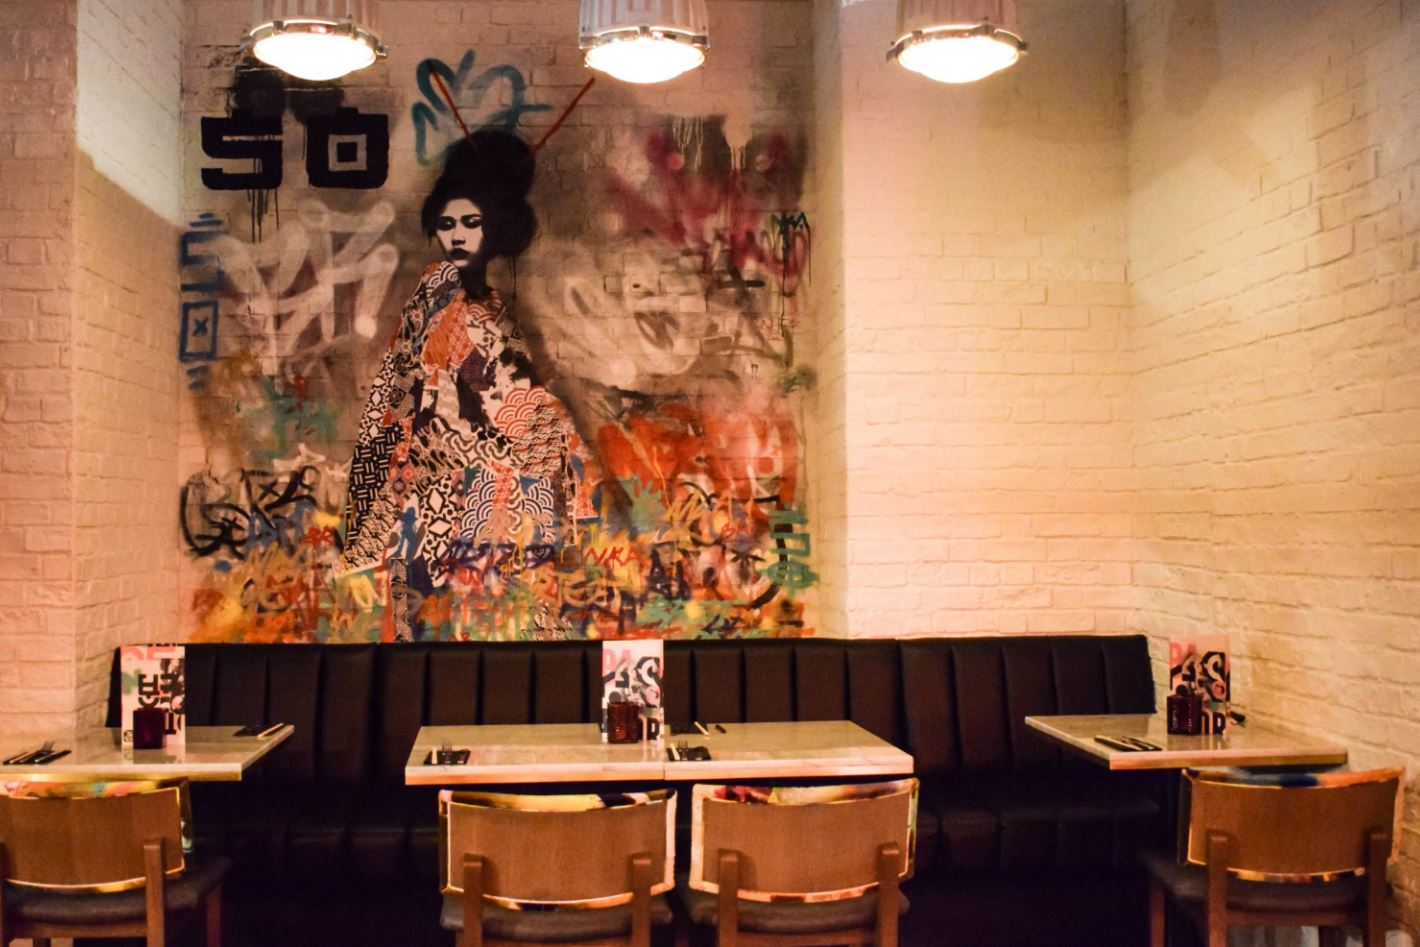 japanese-artwork-soba-upstairs